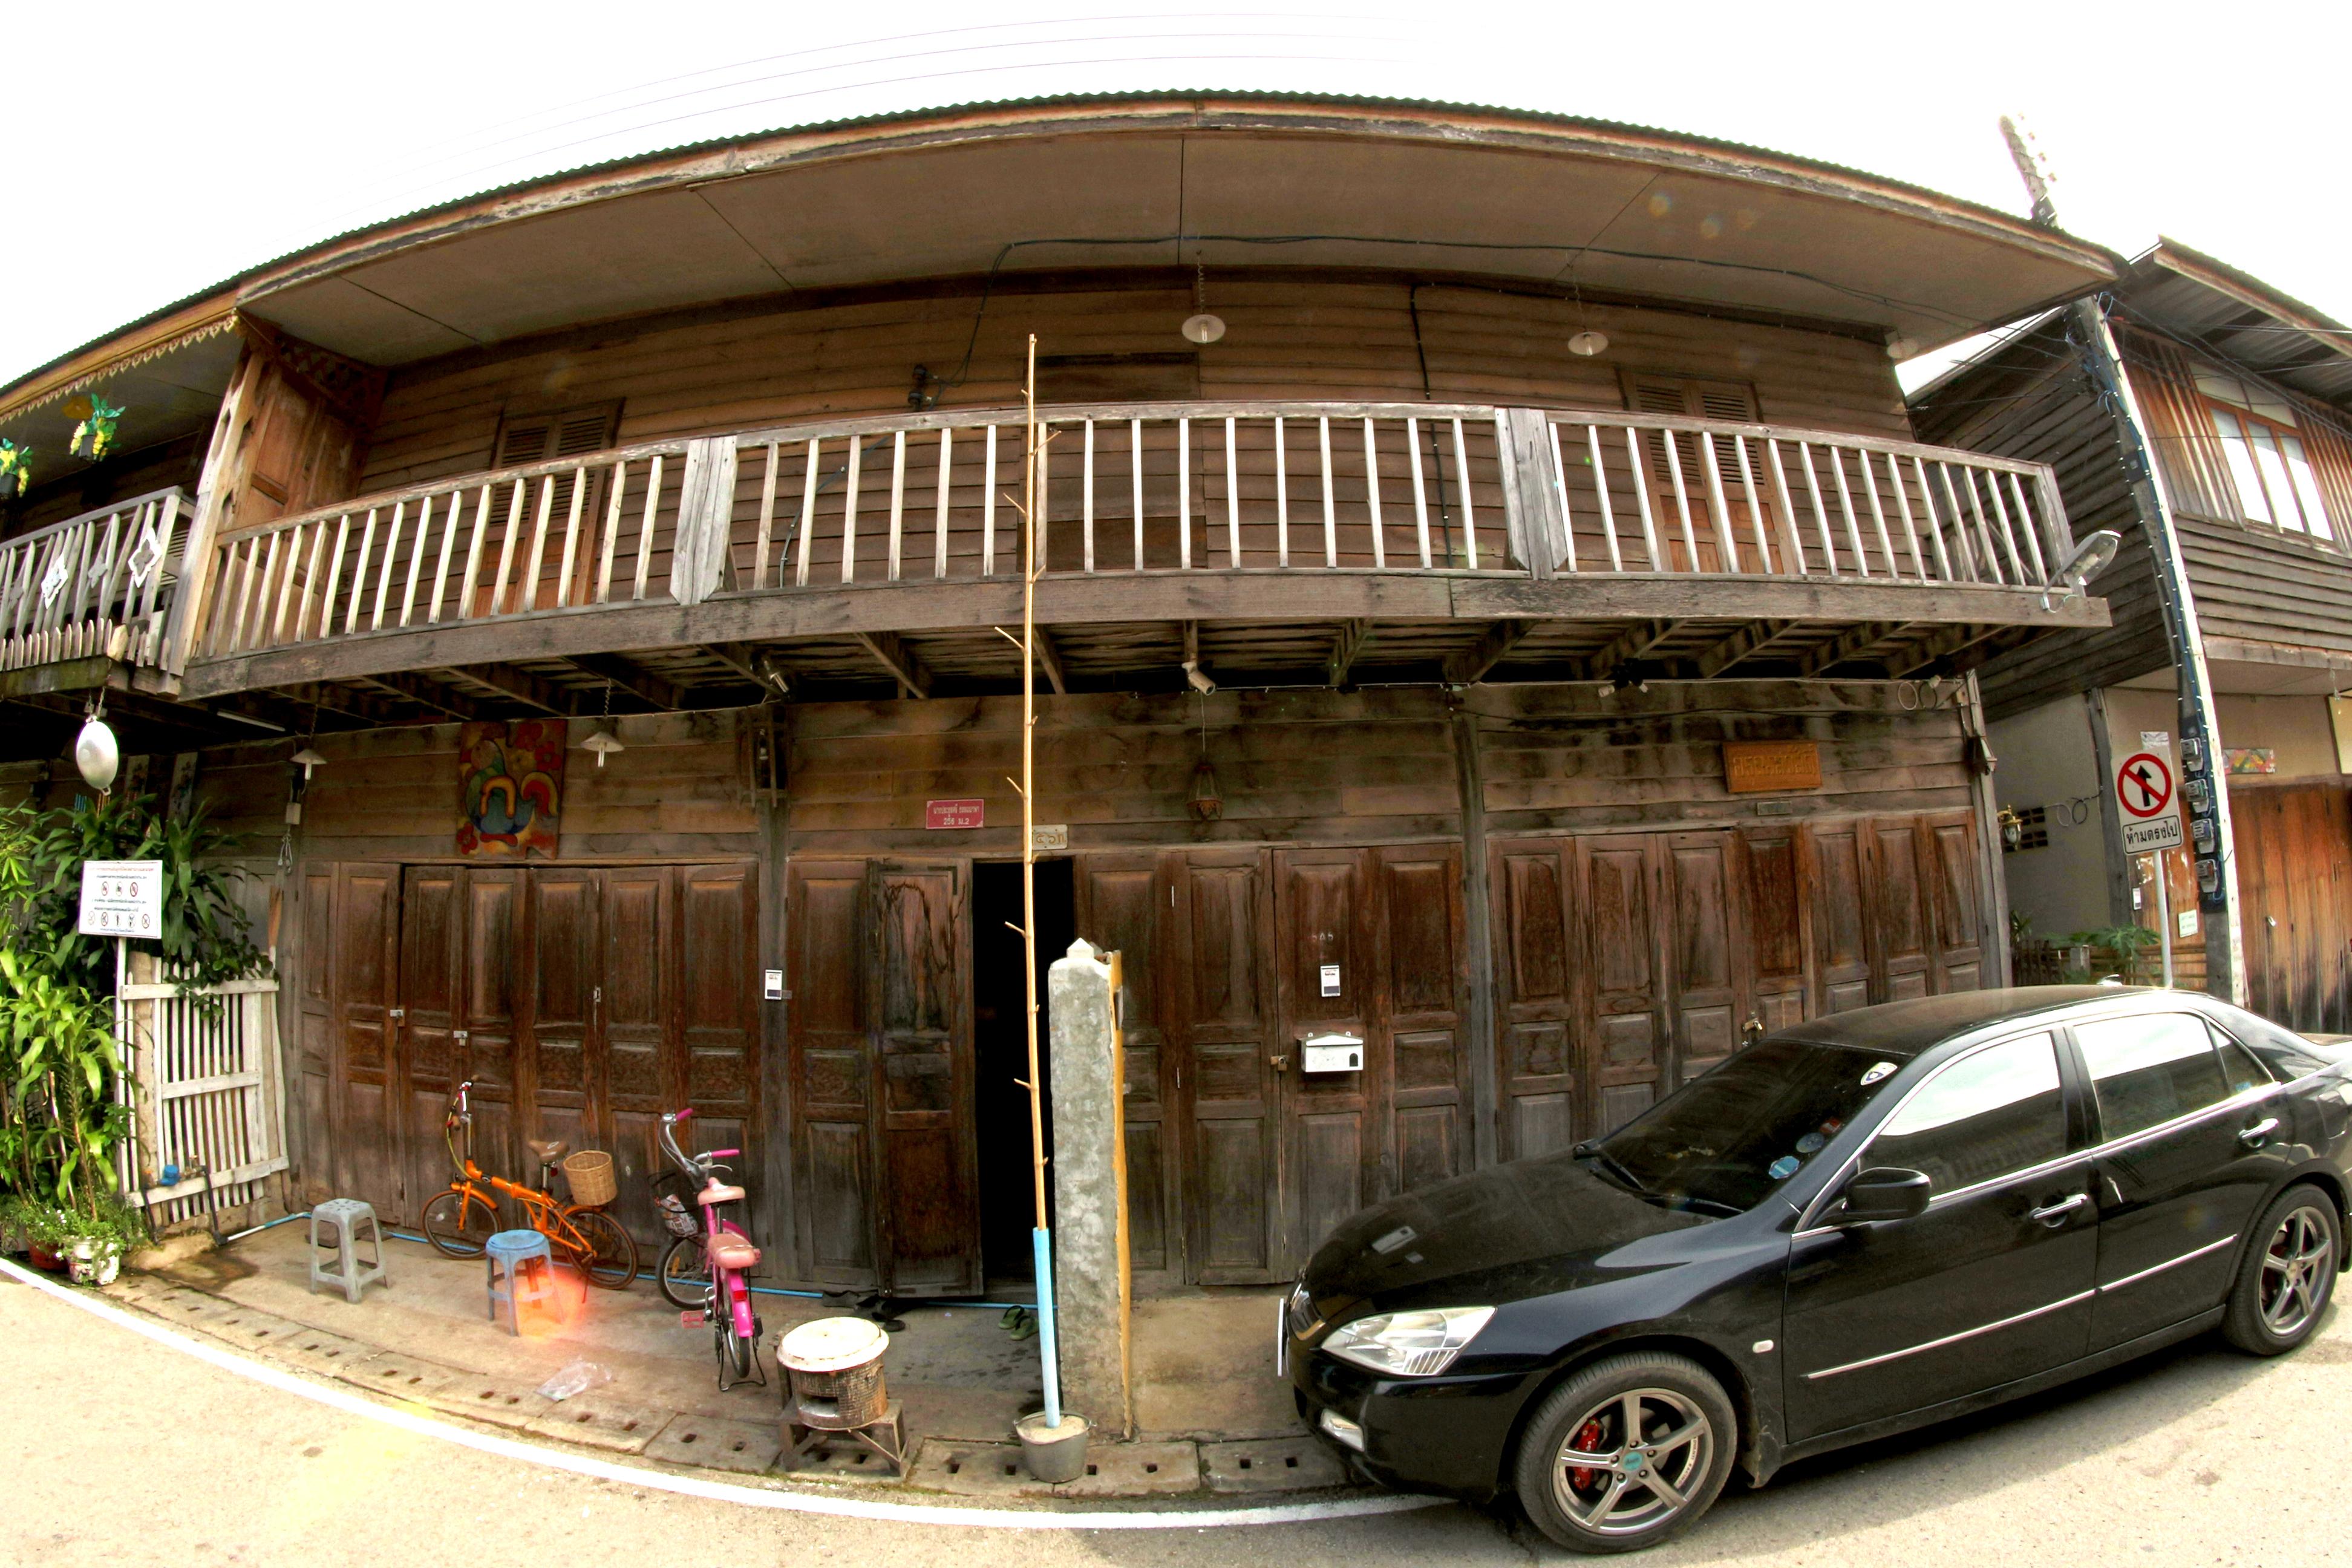 Free stock photo of house, car, vehicle, balcony